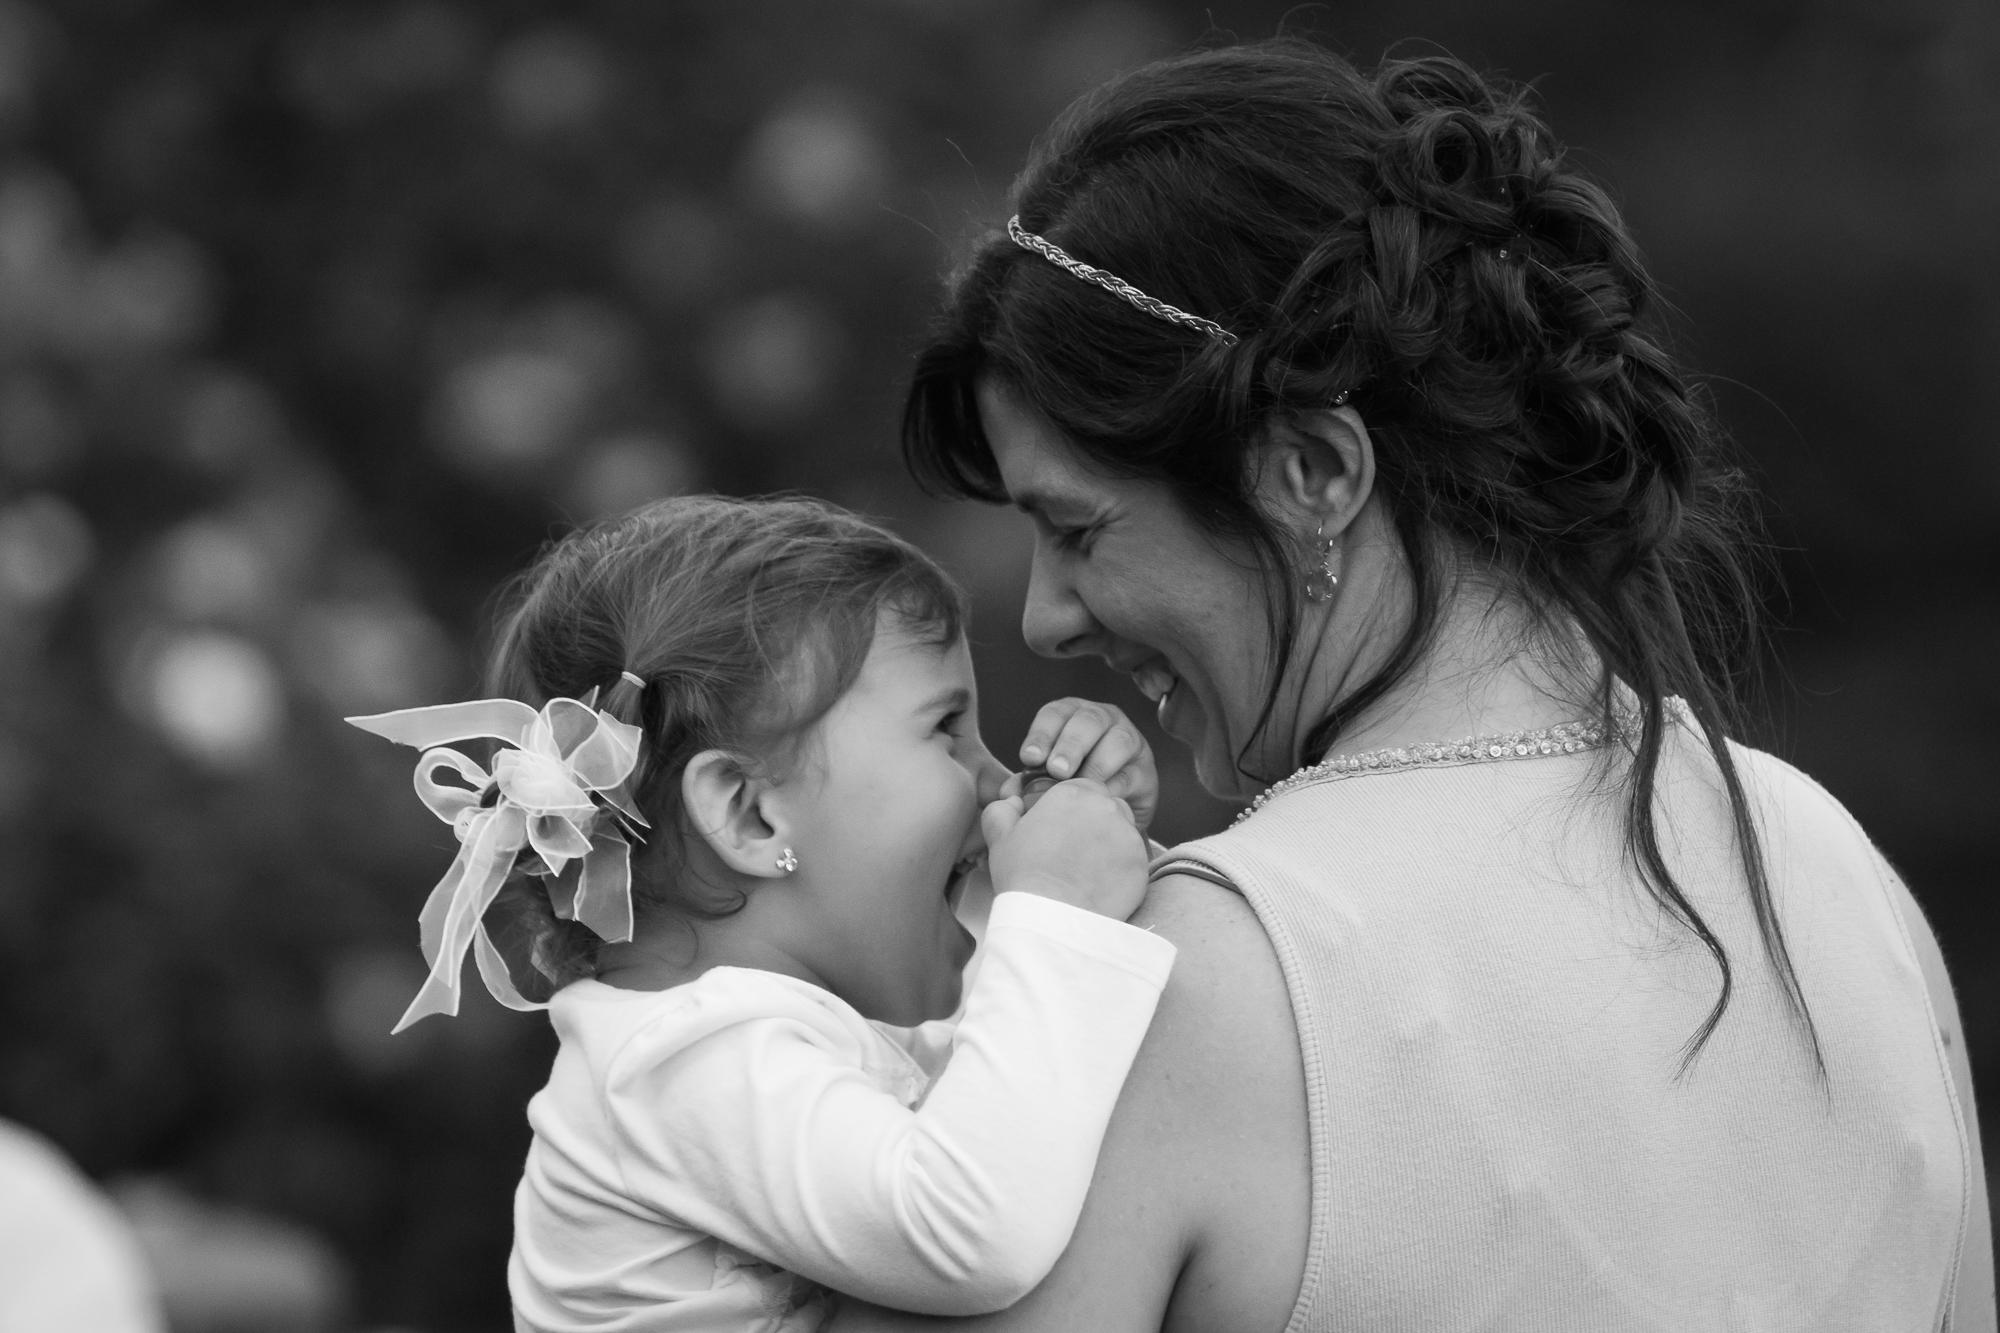 Troscianiec bangor maine wedding photo-02369.JPG